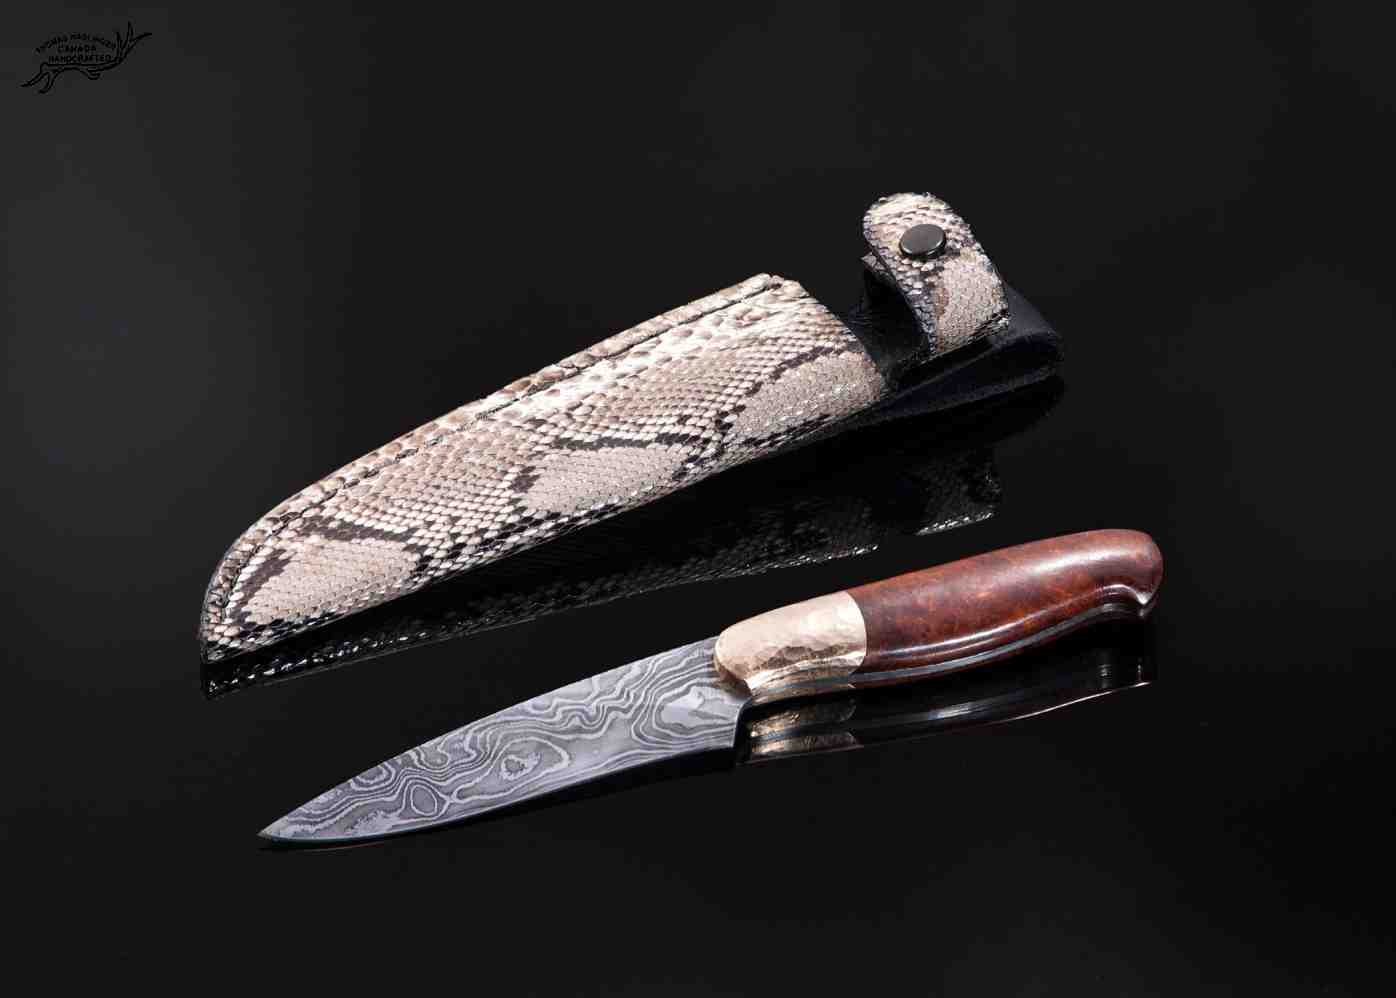 Random damascus gentlemen knife with hammer textured bronze bolsters and python sheath